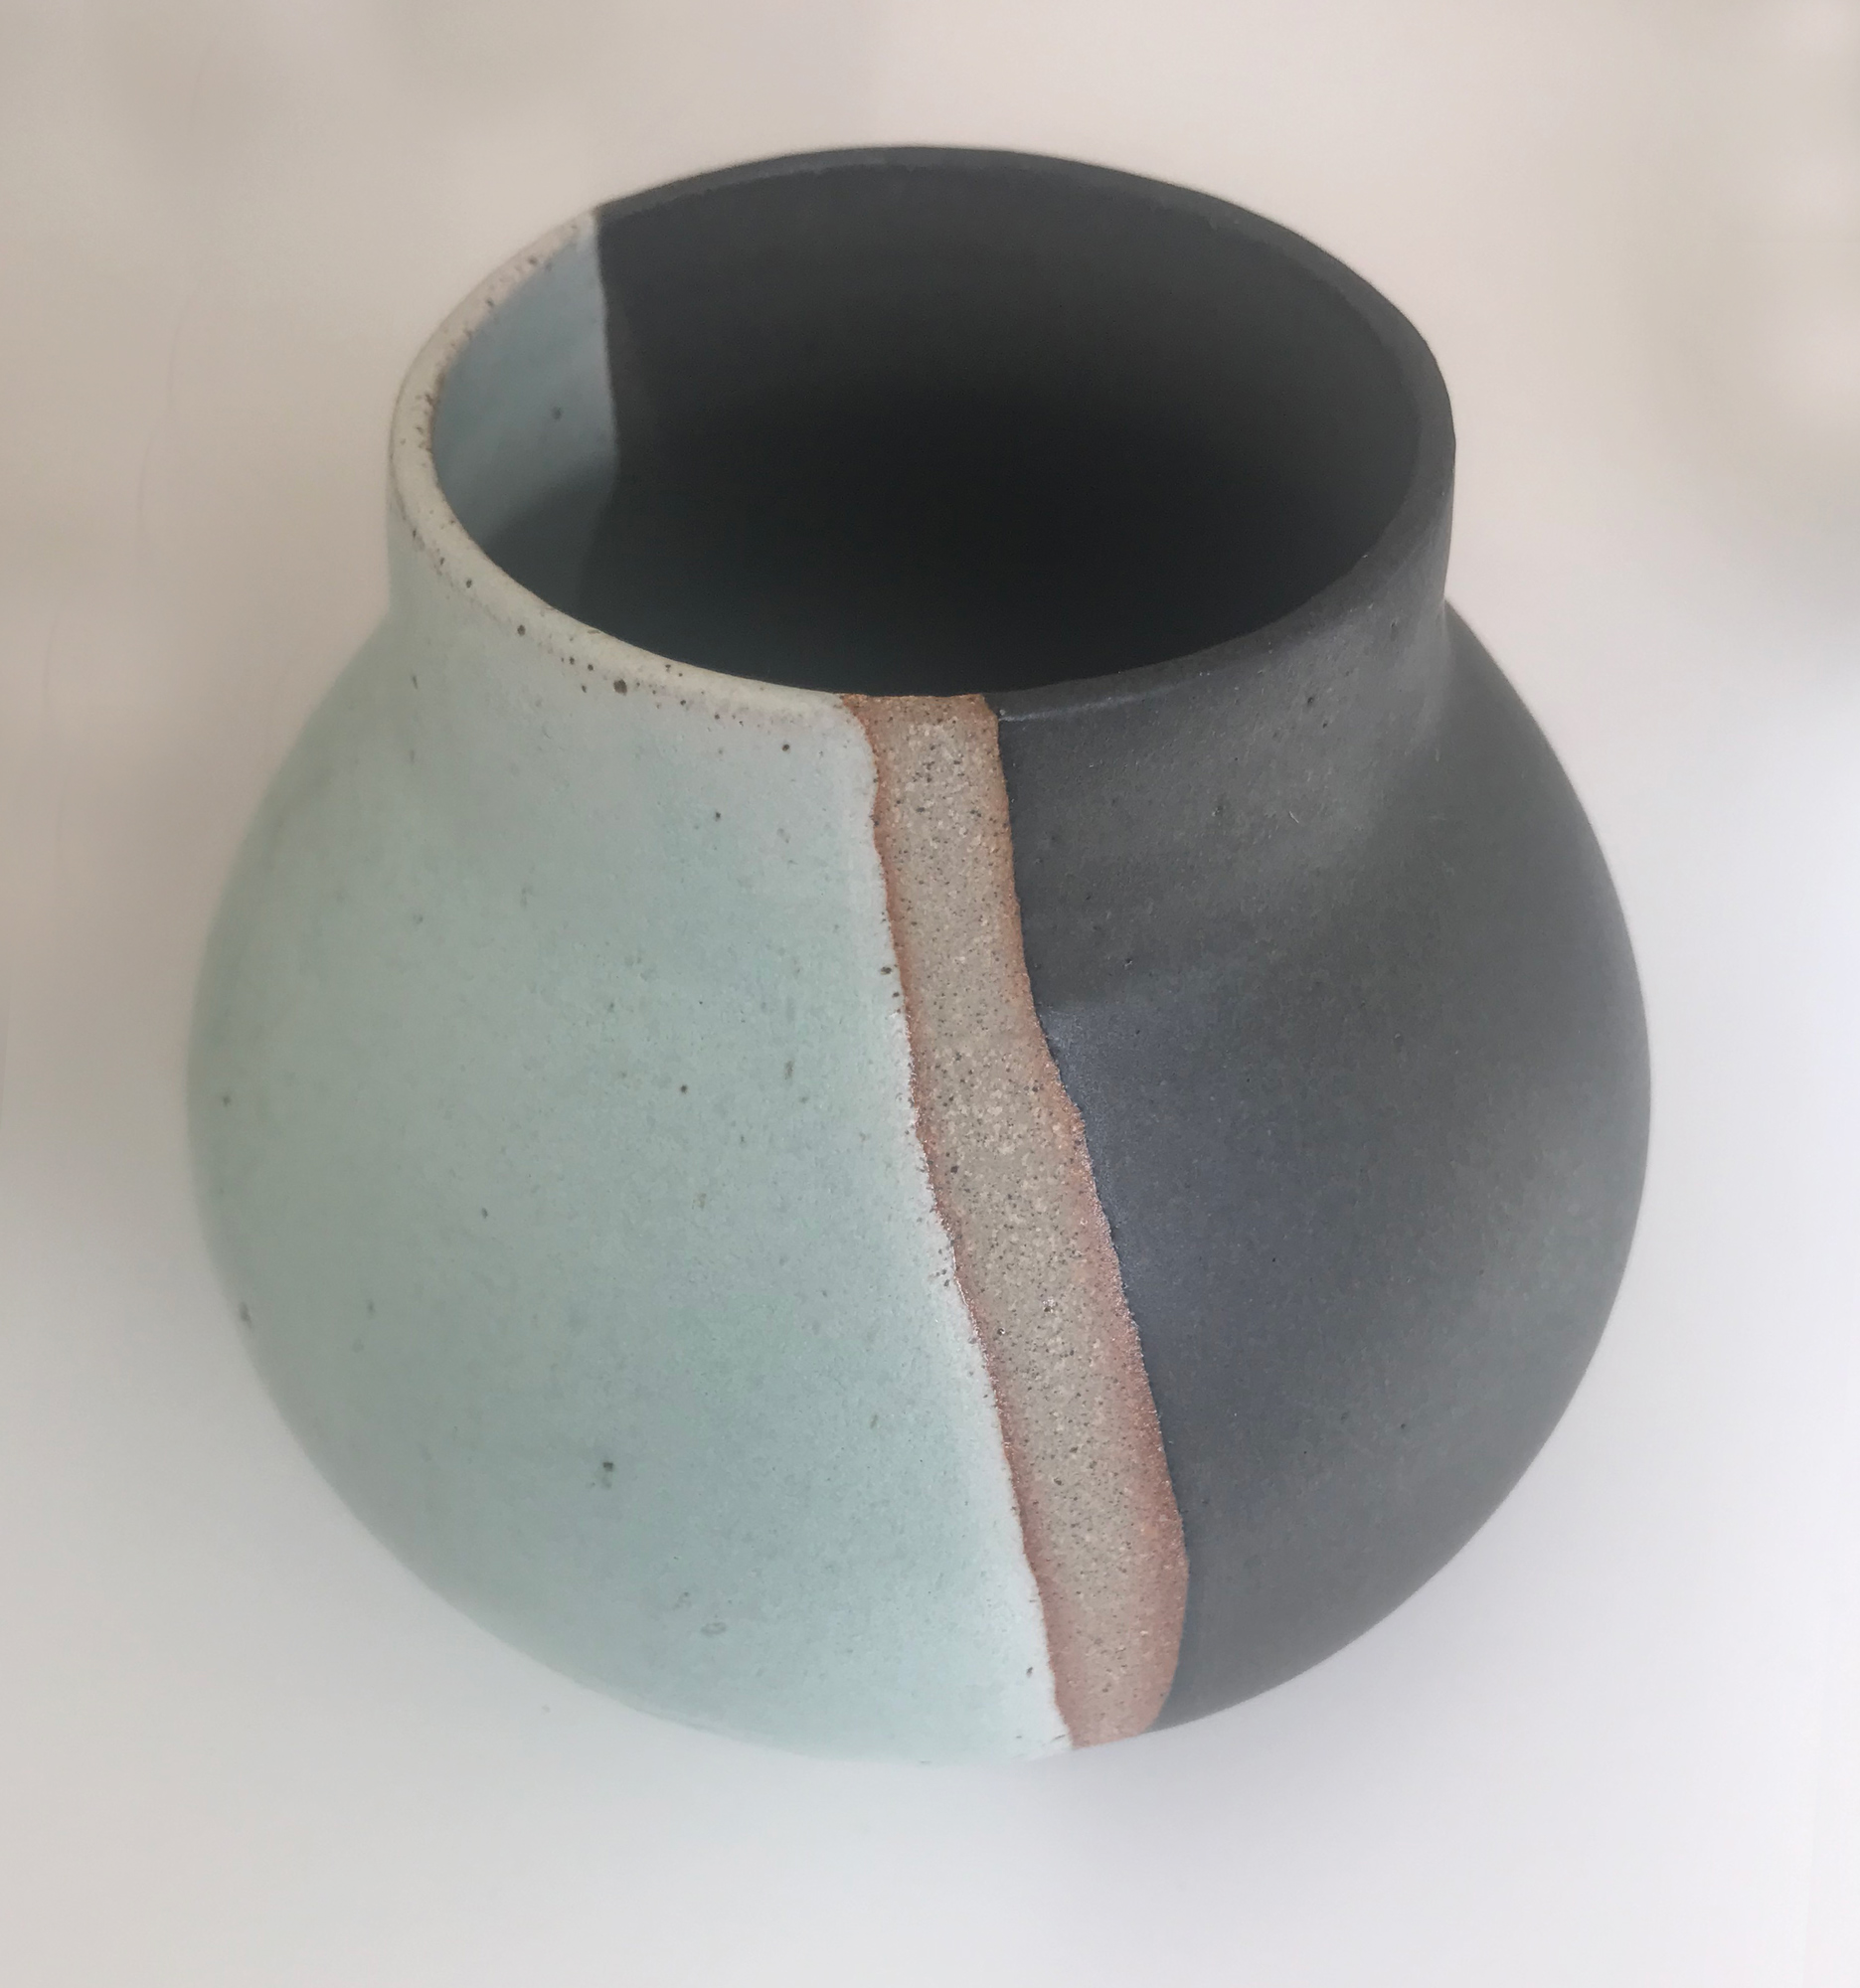 Phaedra Kouseli | Vessel | Ceramic | 14x14cm | £75